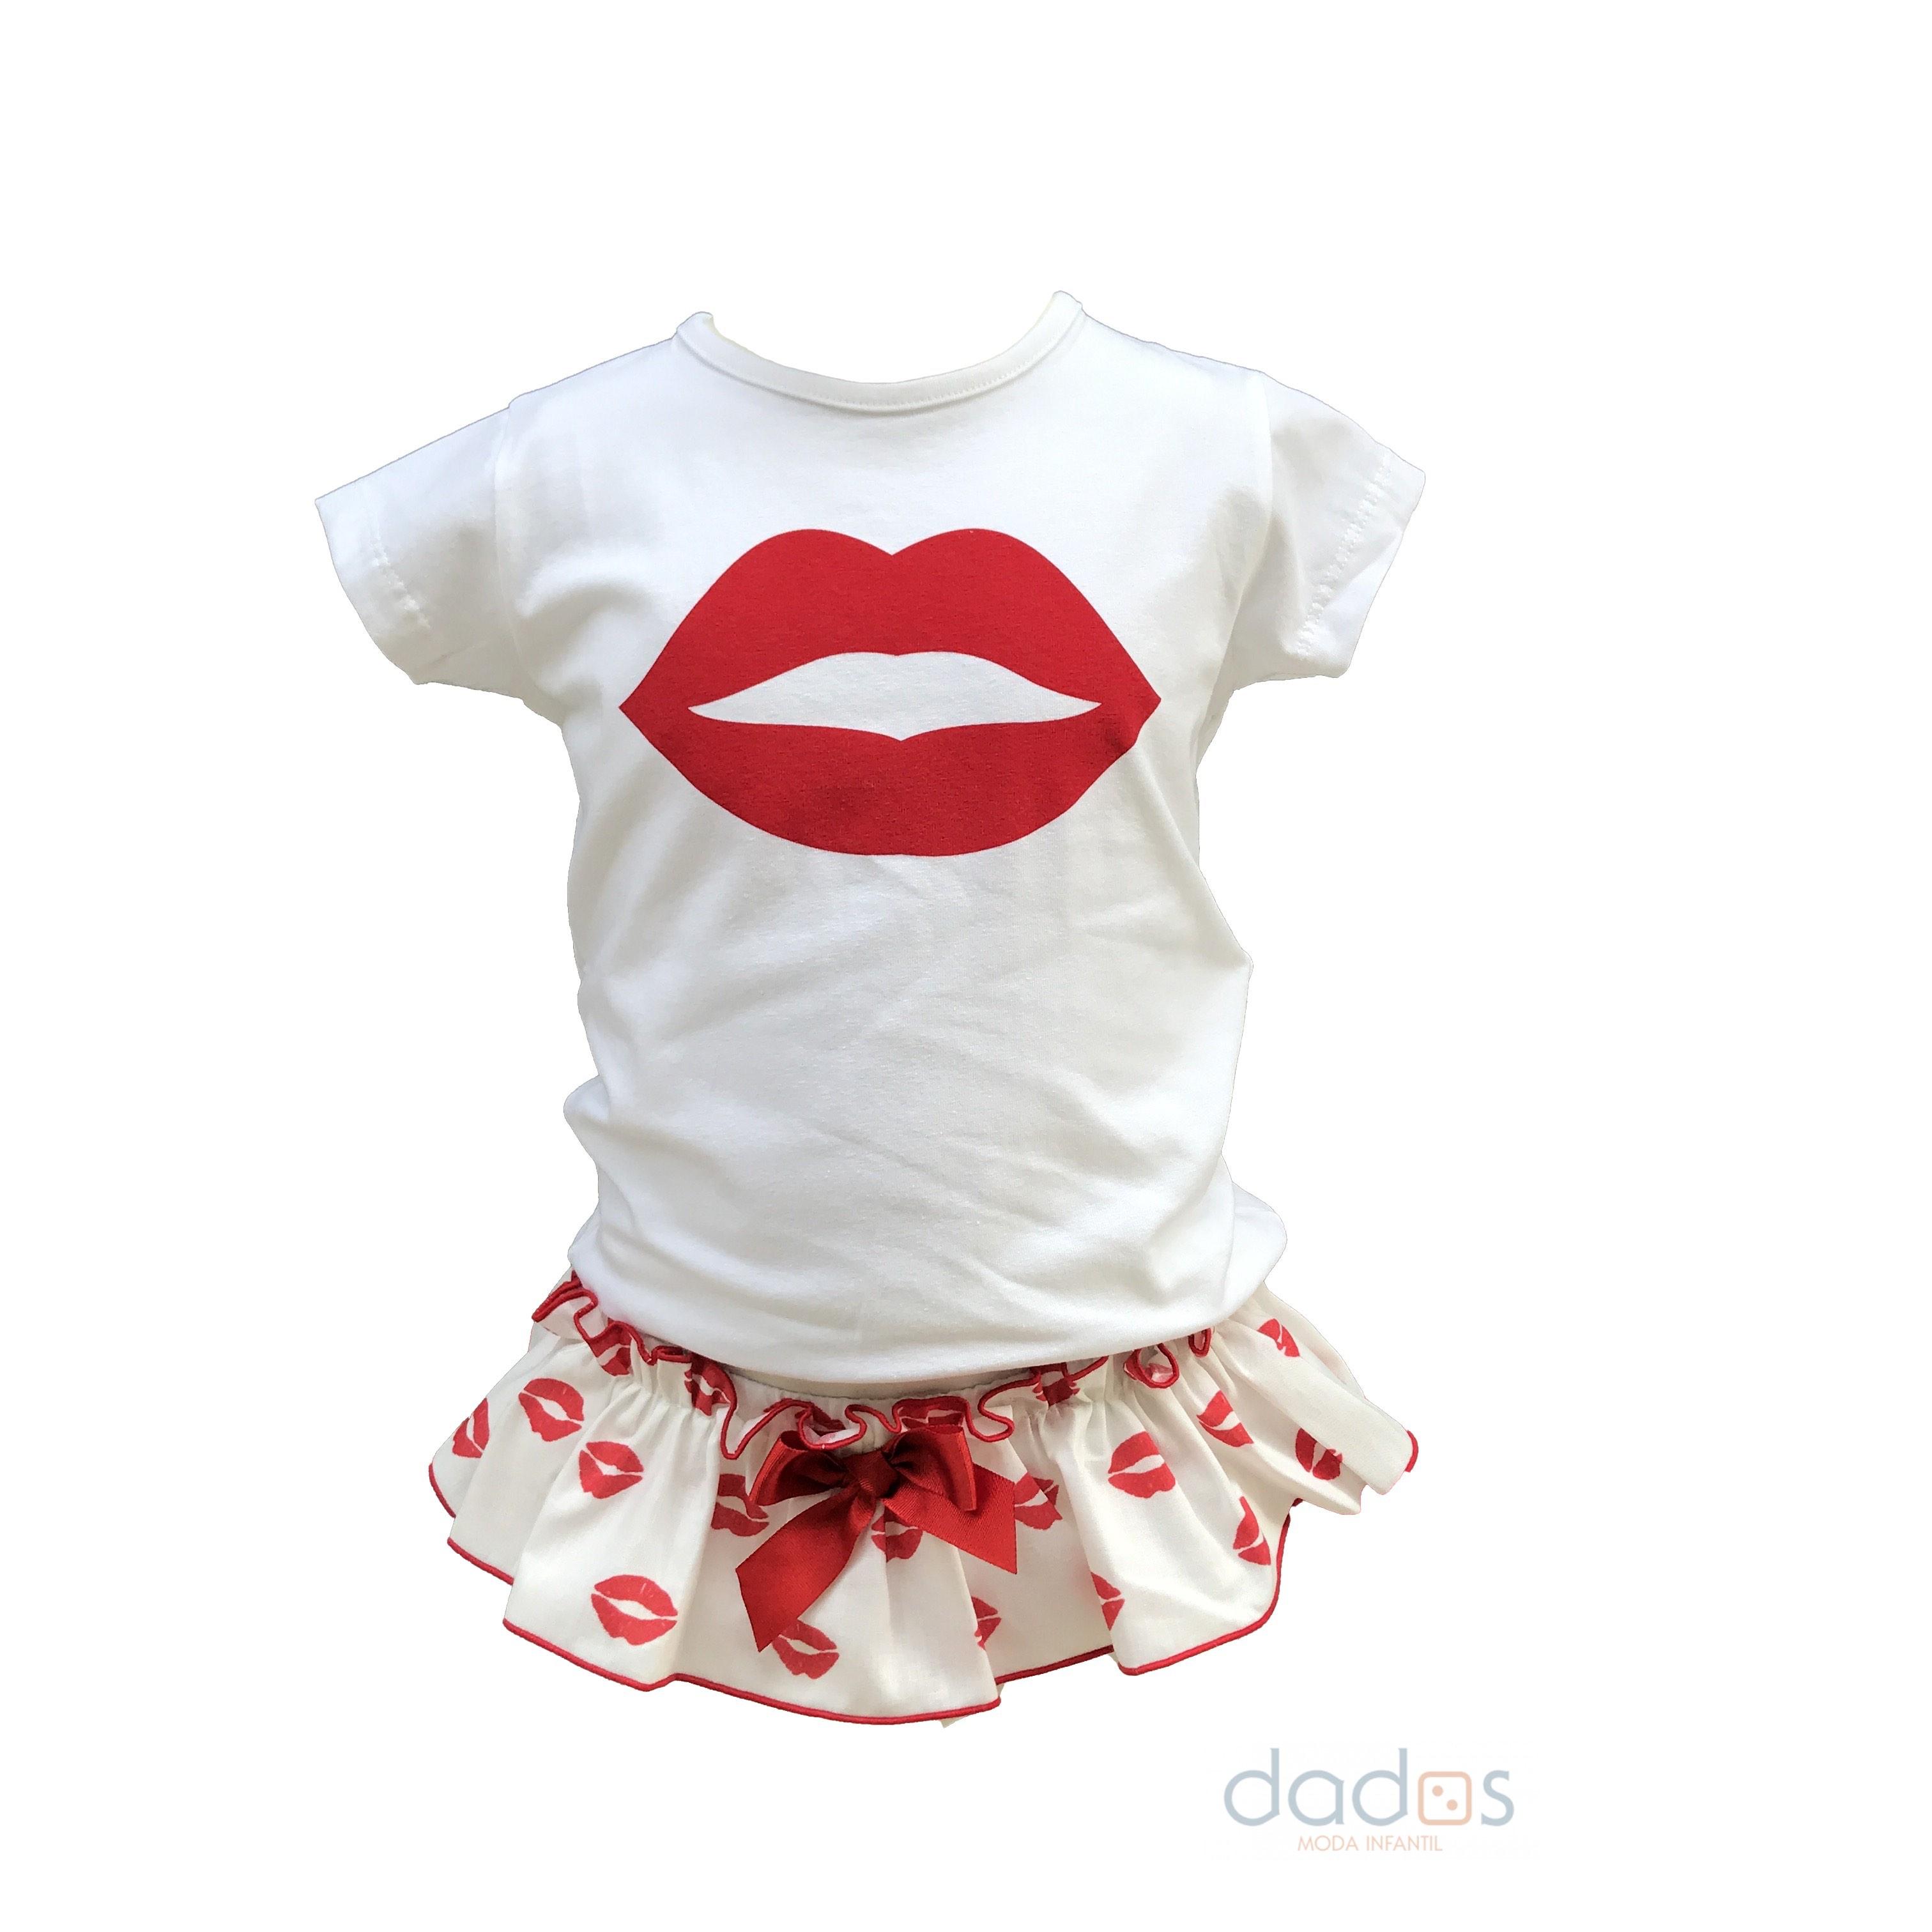 471f933b0 Mon Petit Bonbon conjunto labios cubre y camiseta - Dados moda infantil